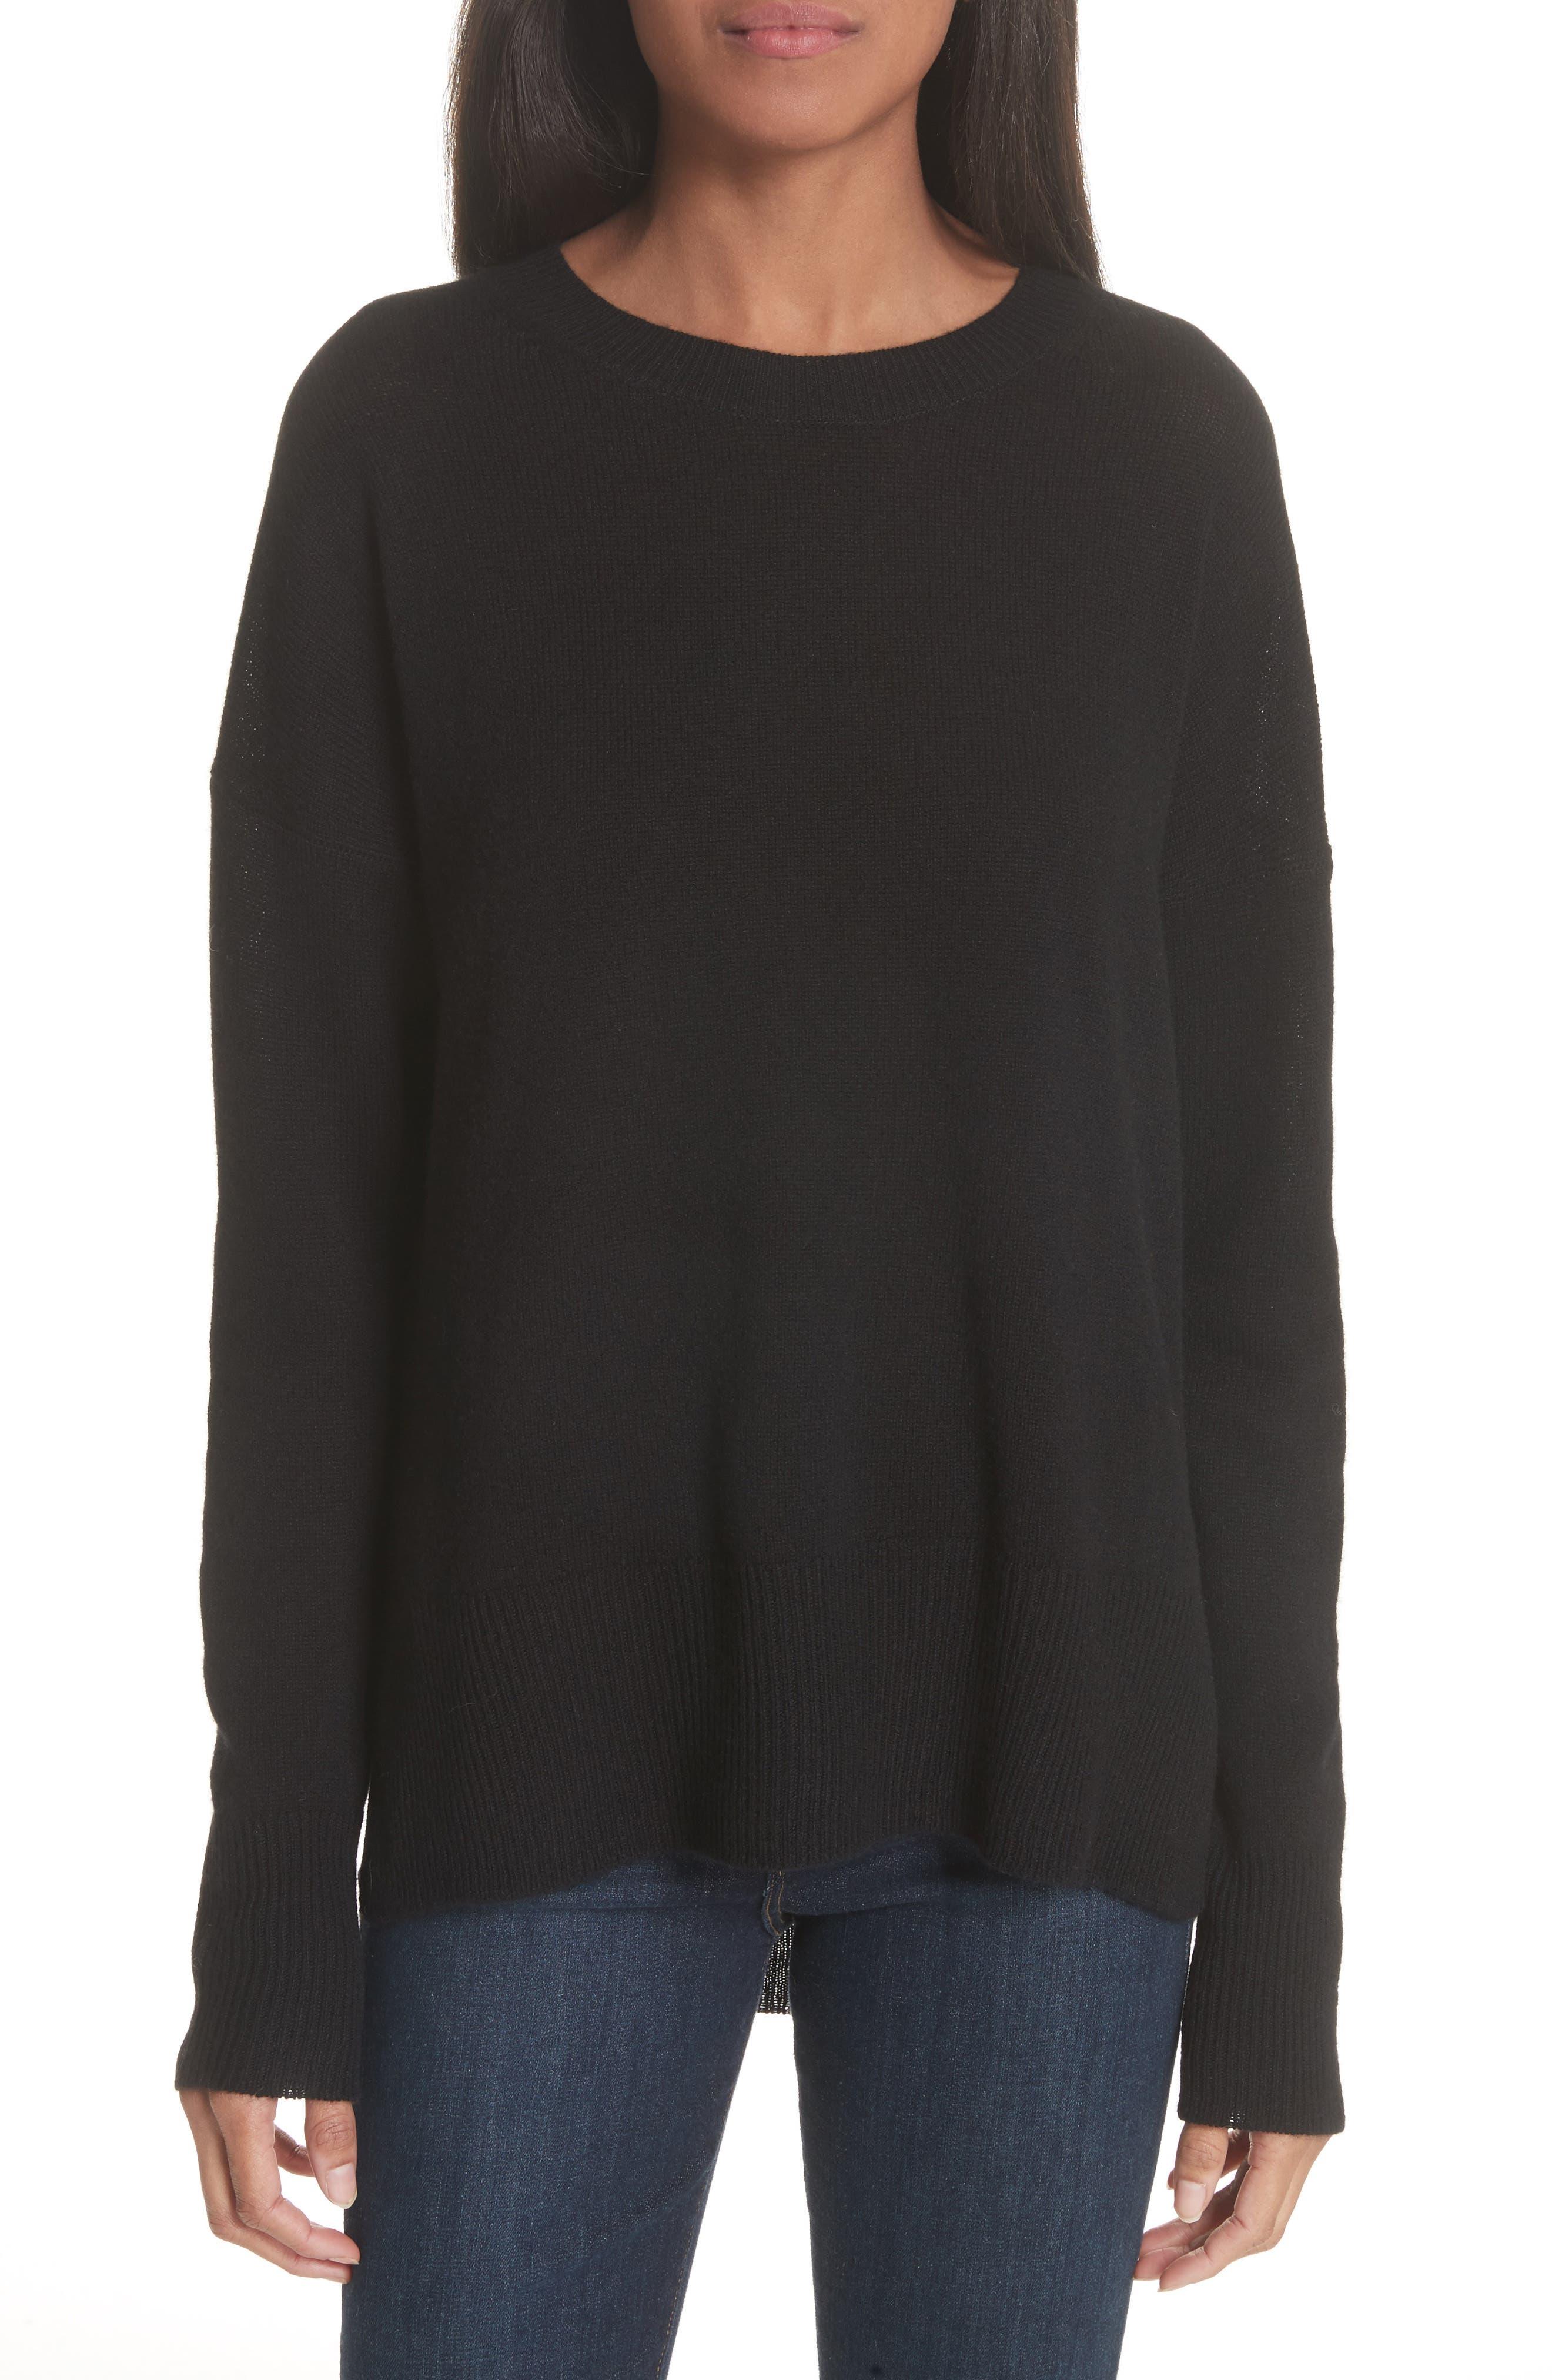 THEORY,                             Karenia L Cashmere Sweater,                             Main thumbnail 1, color,                             001